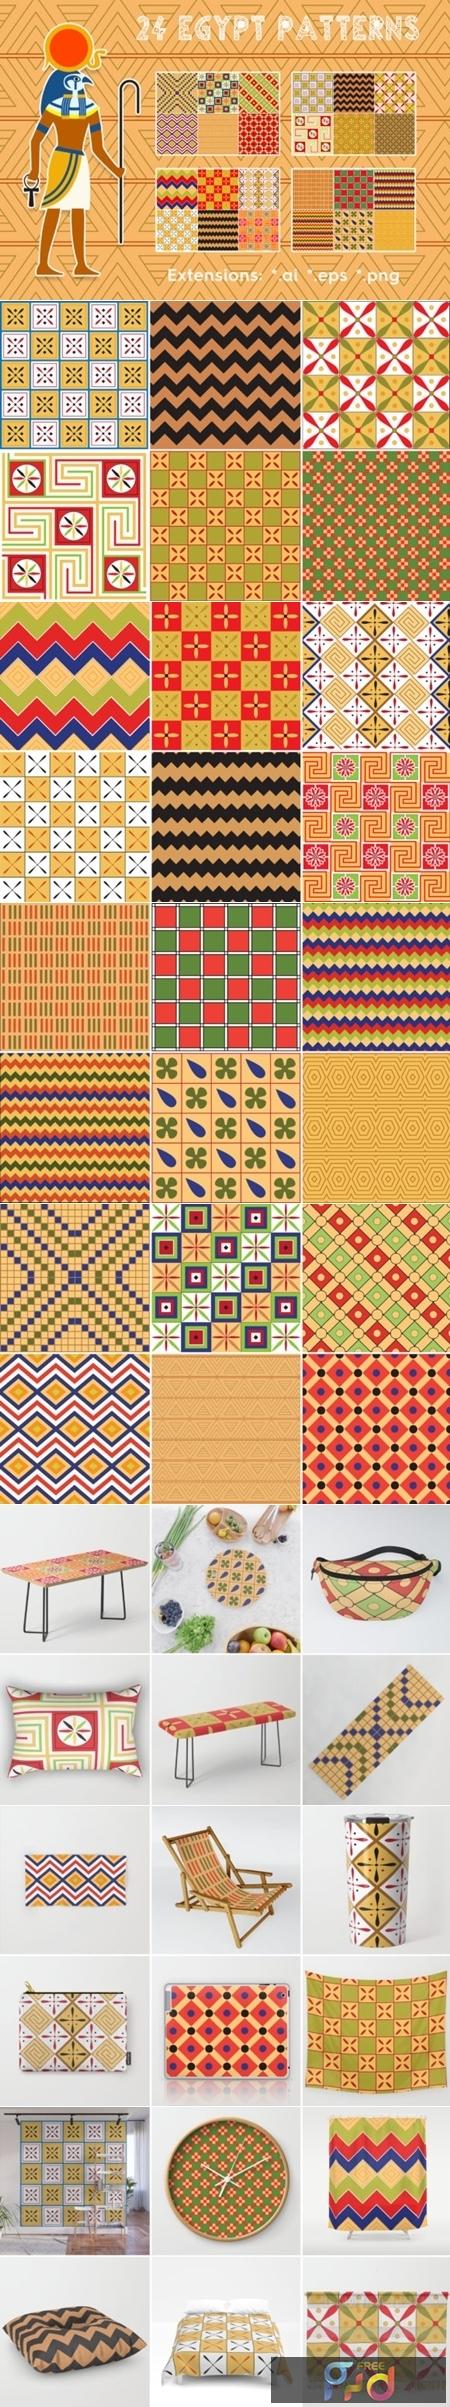 24 Egypt Patterns 2002947 1